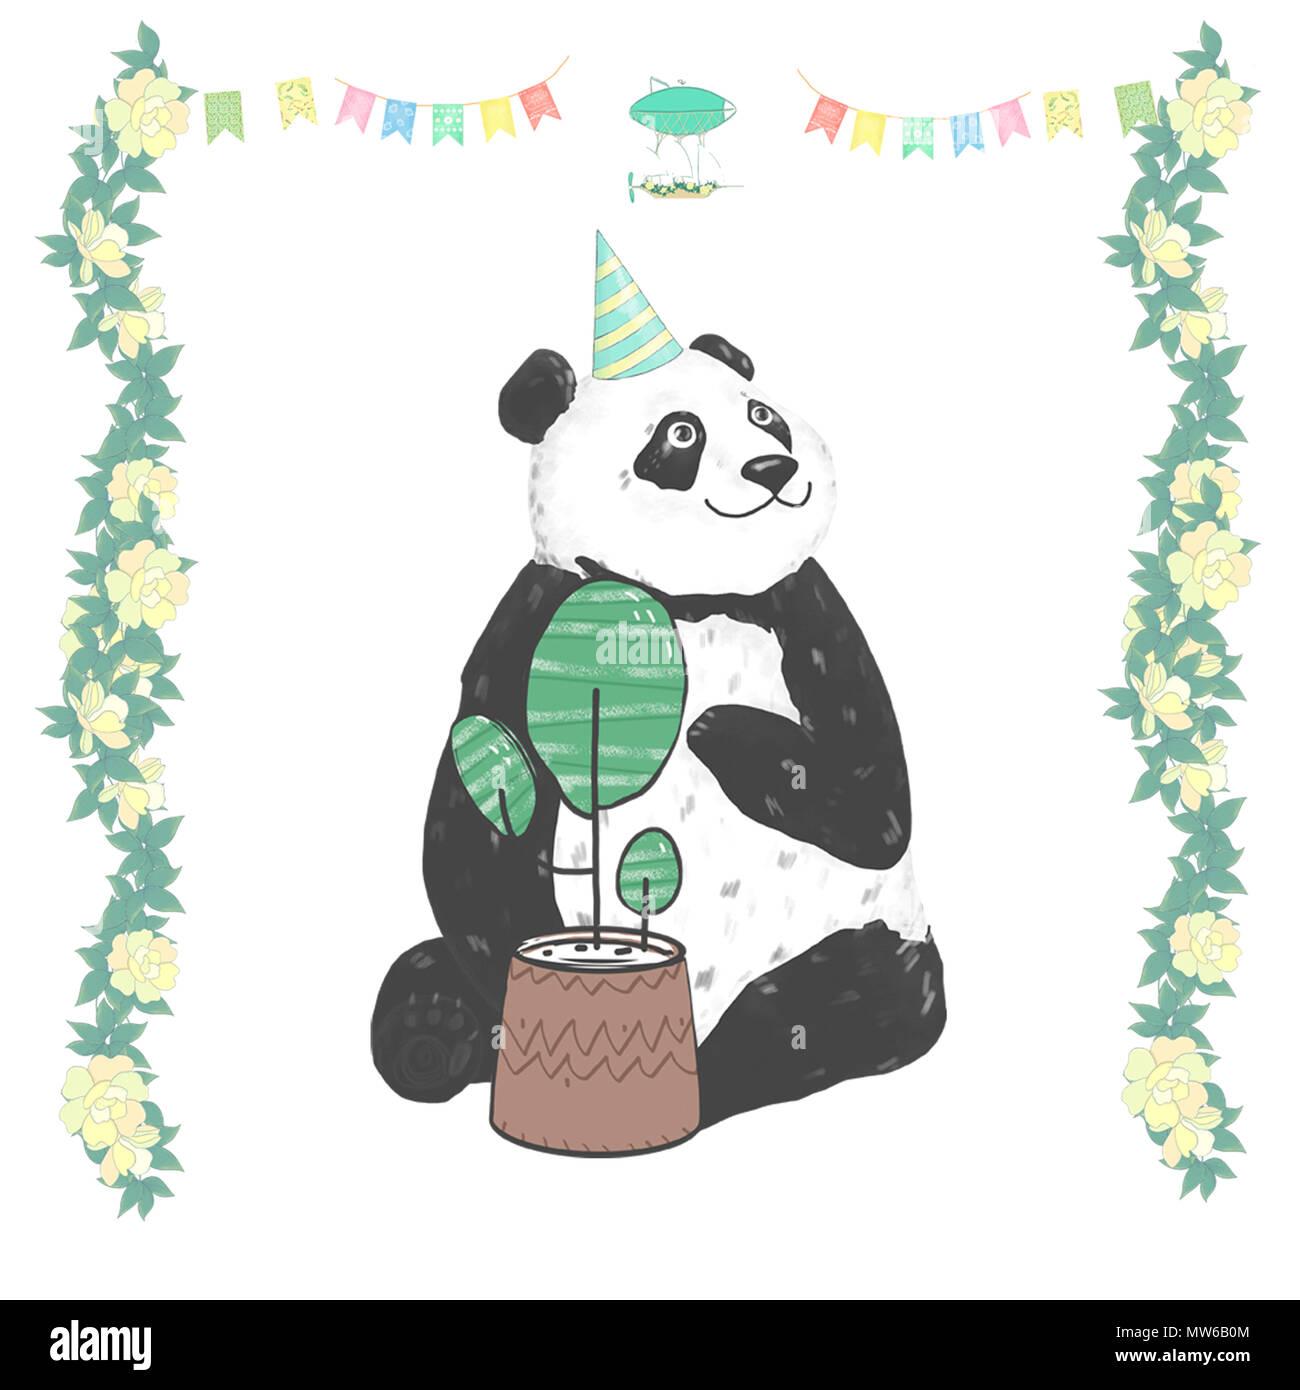 illustration panda stockfotos illustration panda bilder. Black Bedroom Furniture Sets. Home Design Ideas